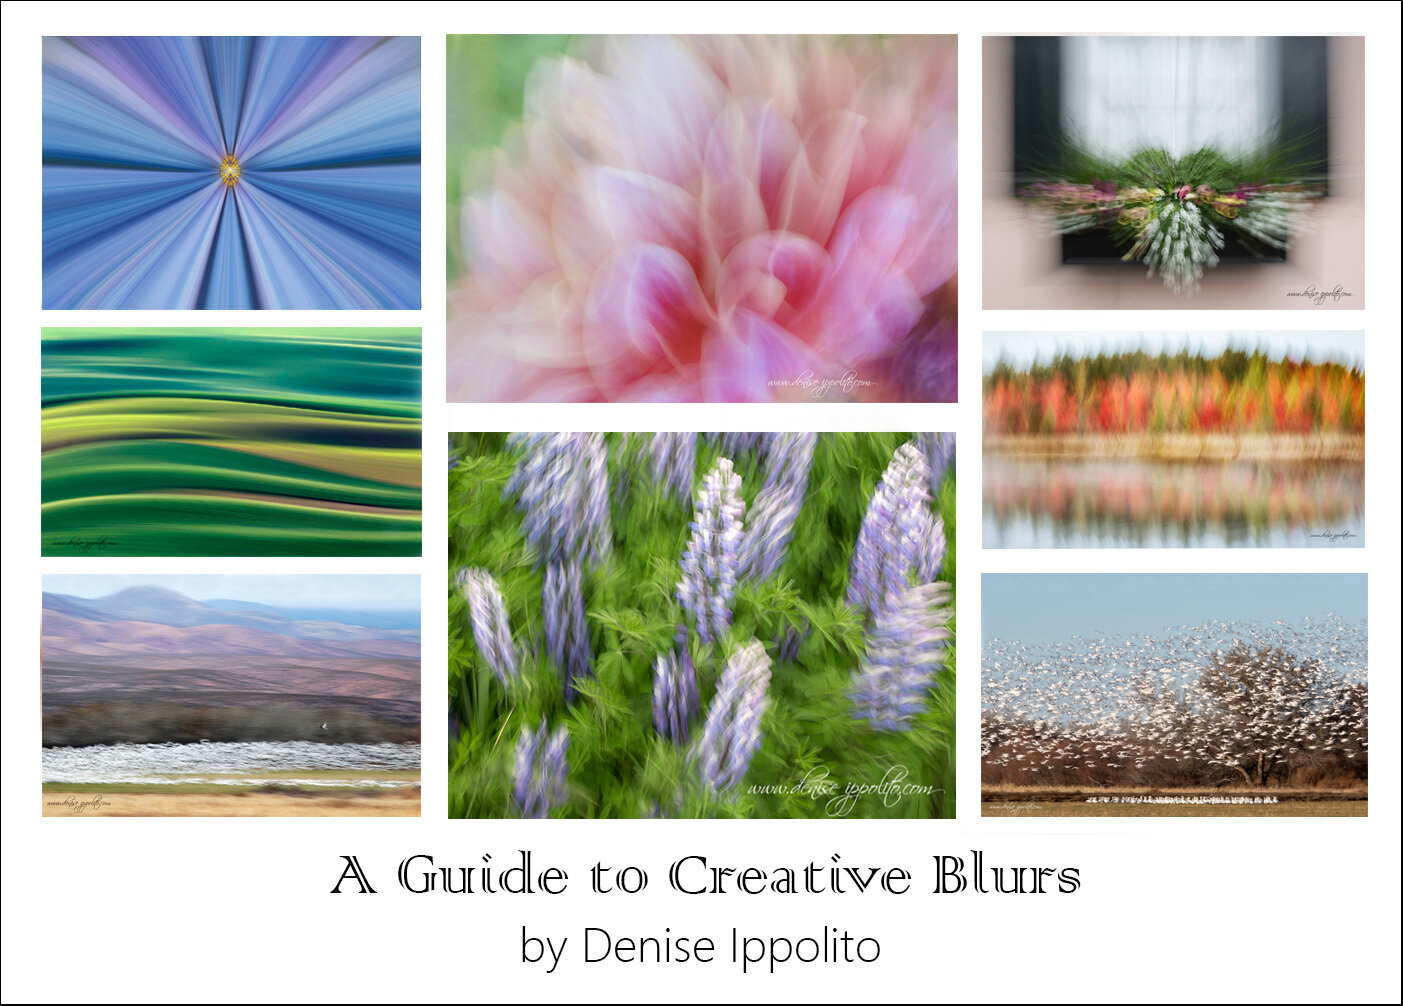 Guide-to-Creative-Blurs (2).jpg